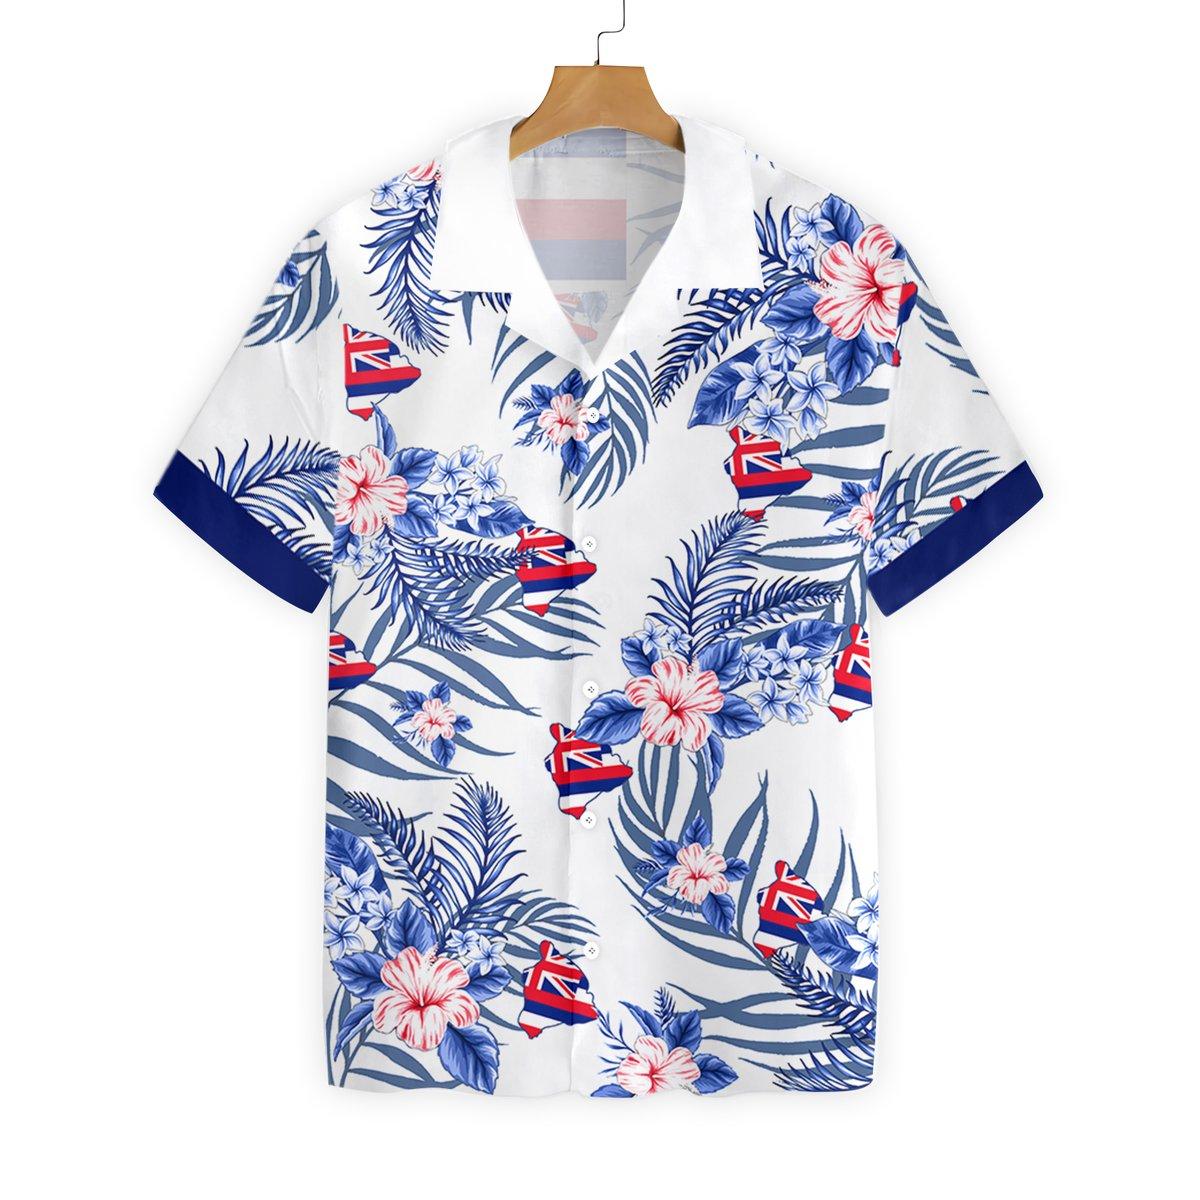 TOP HOT HAWAIIAN SHIRT FOR MEN 14